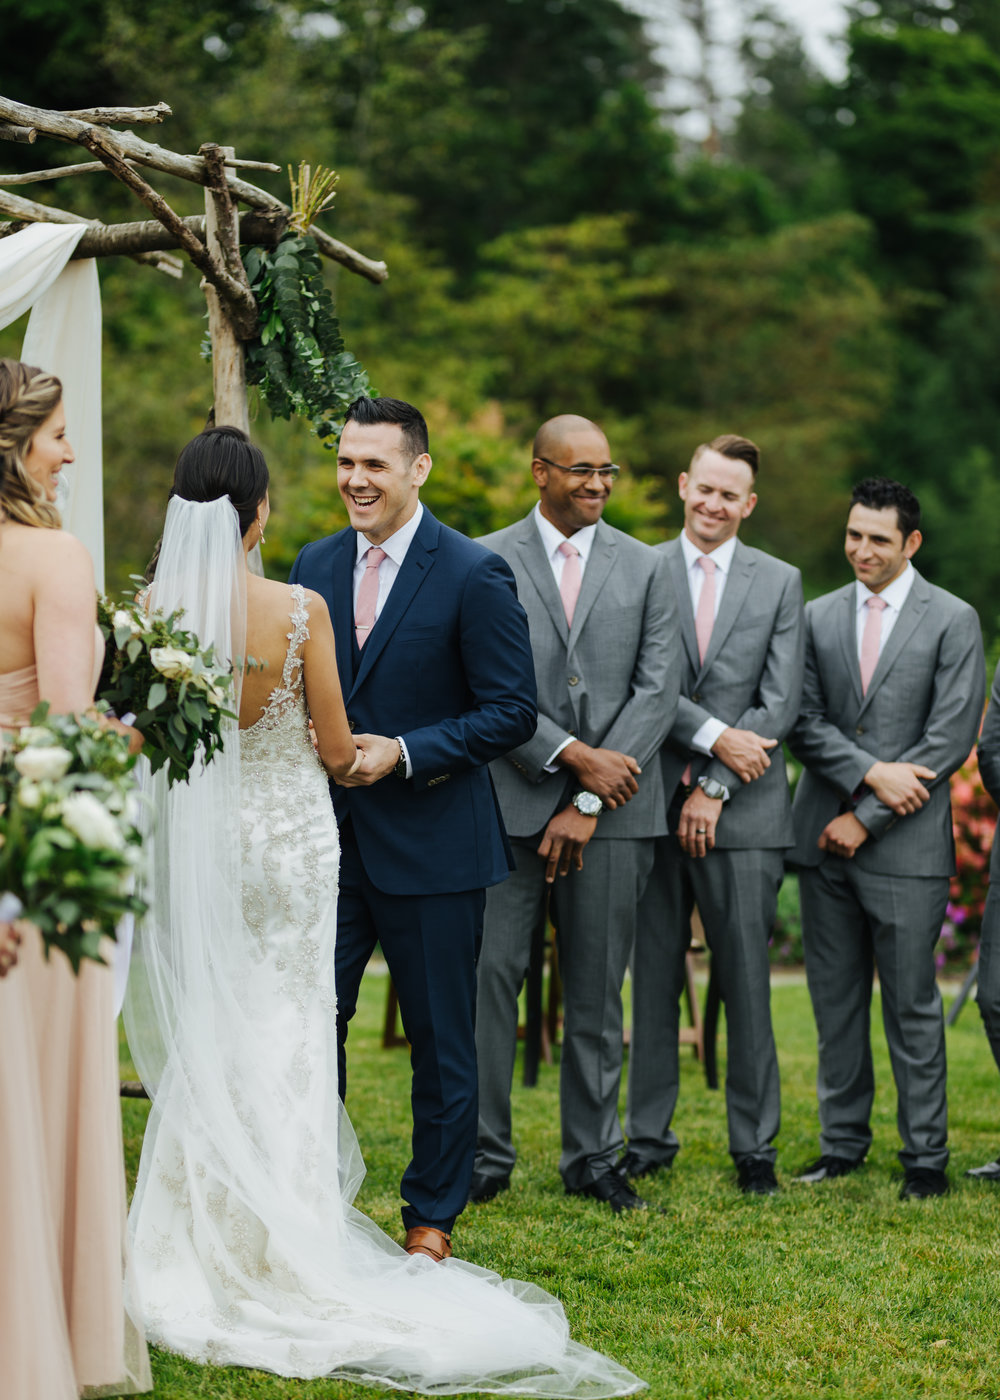 herafilms_wedding_jayne_connor_hera_selects-63.jpg